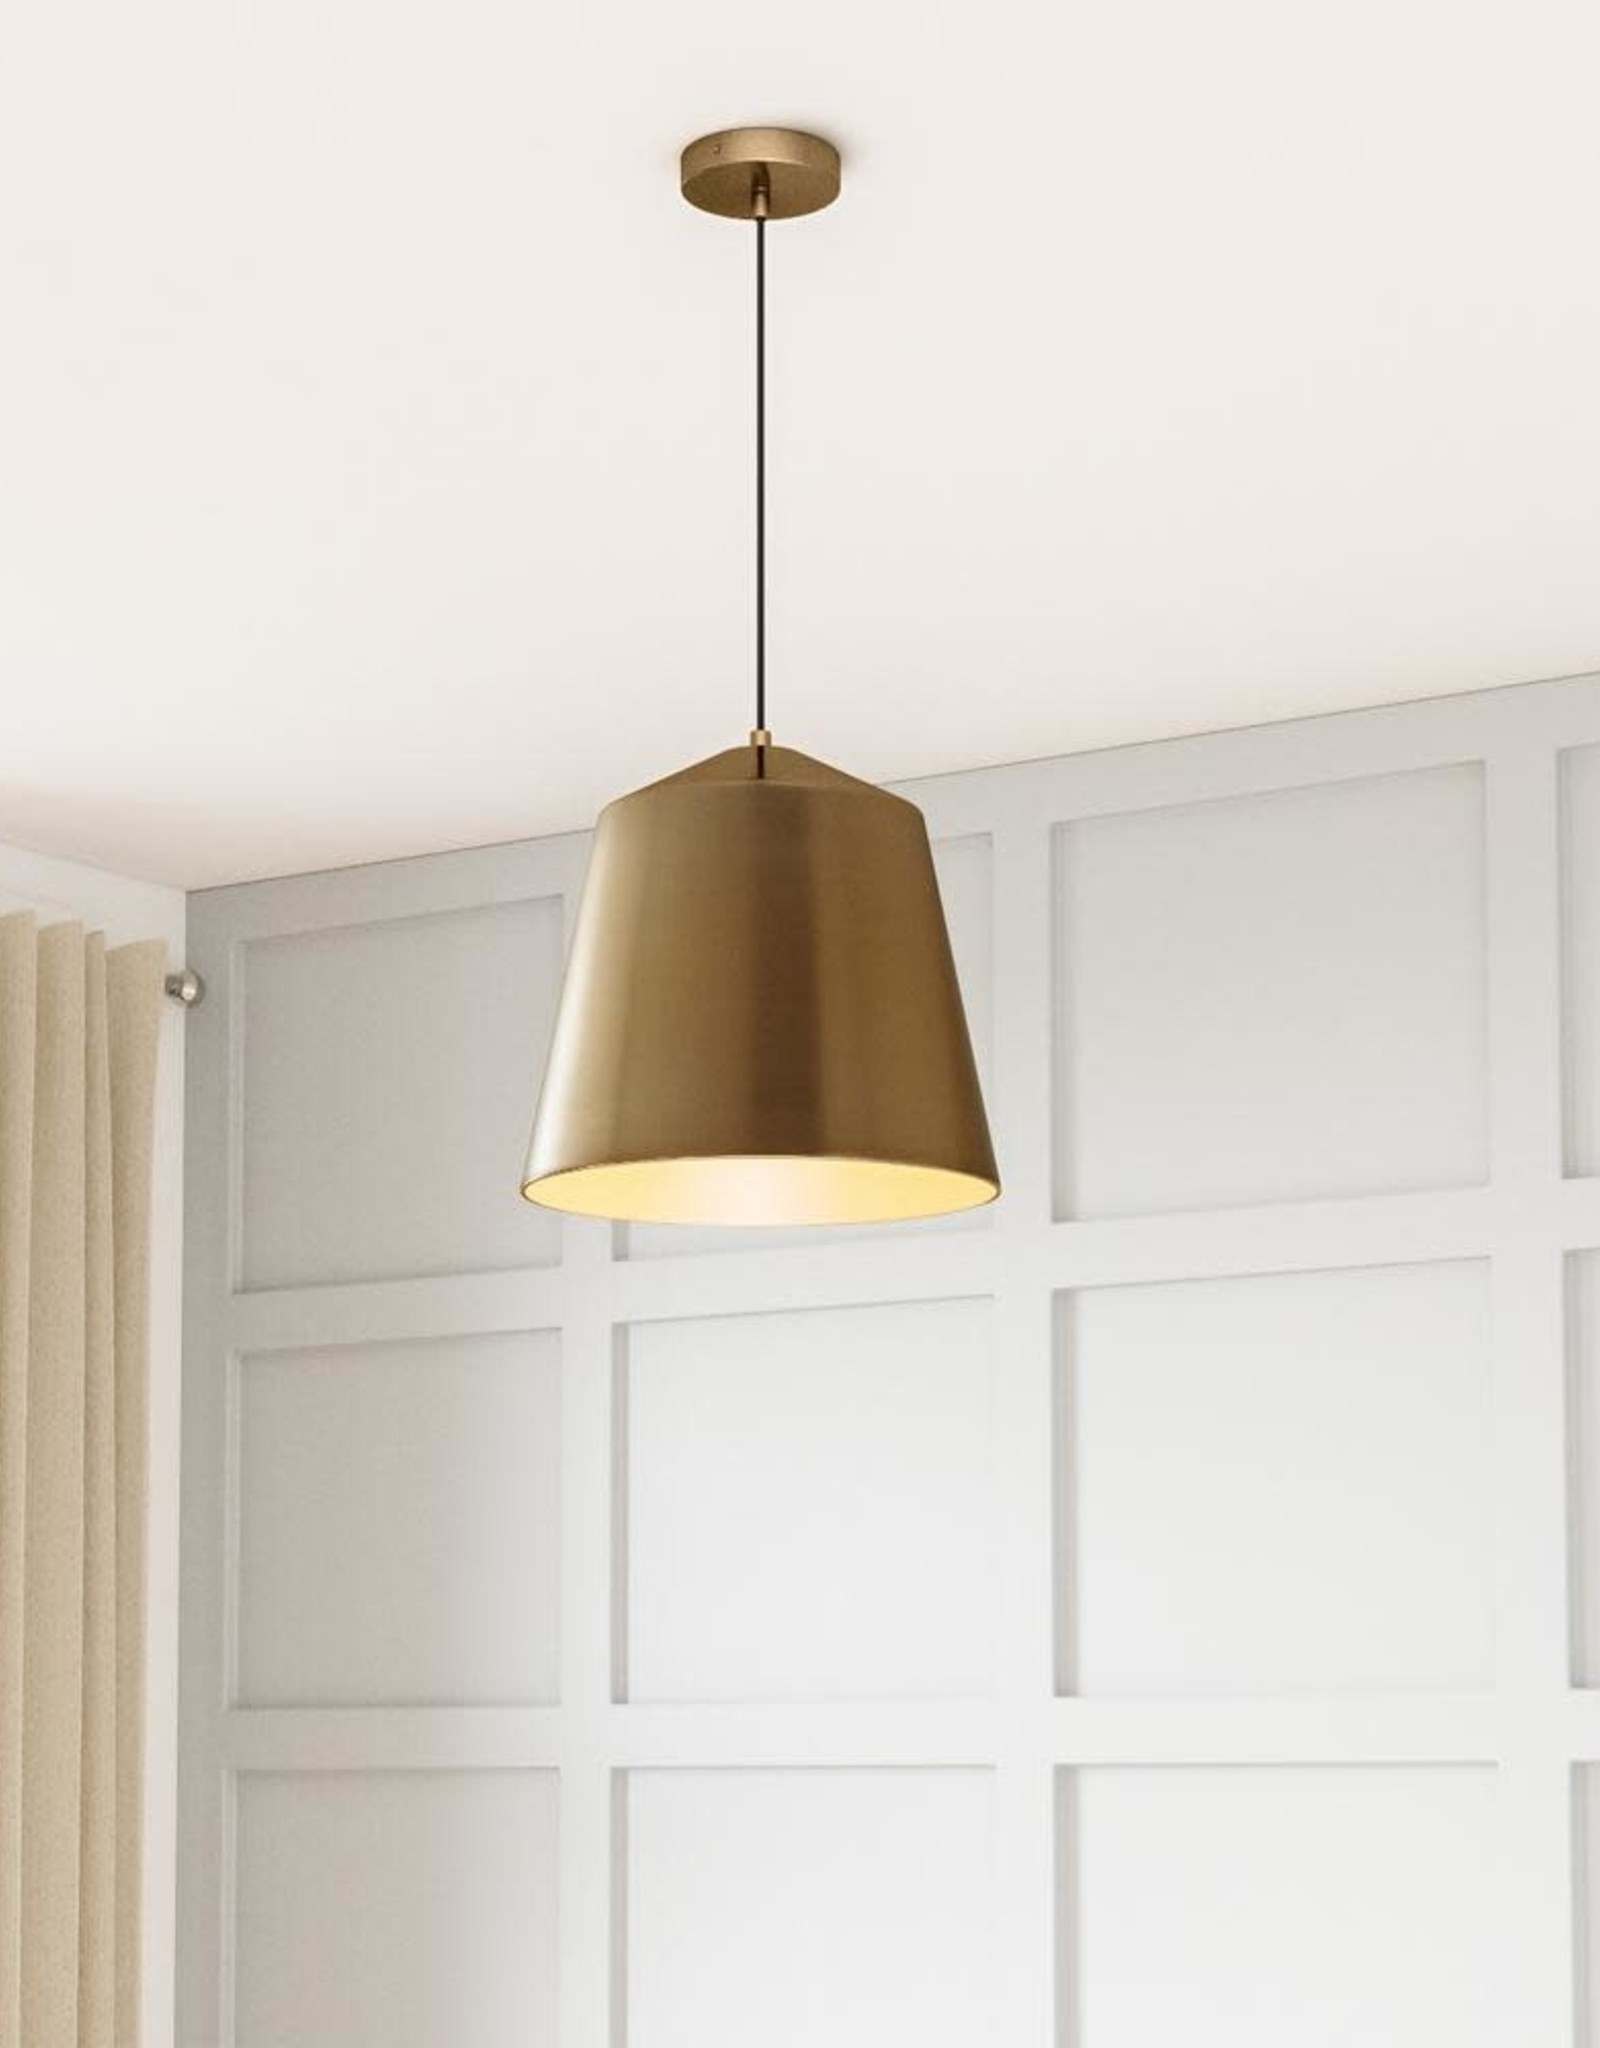 Home Decorators Collection 1-Light Metal Brass